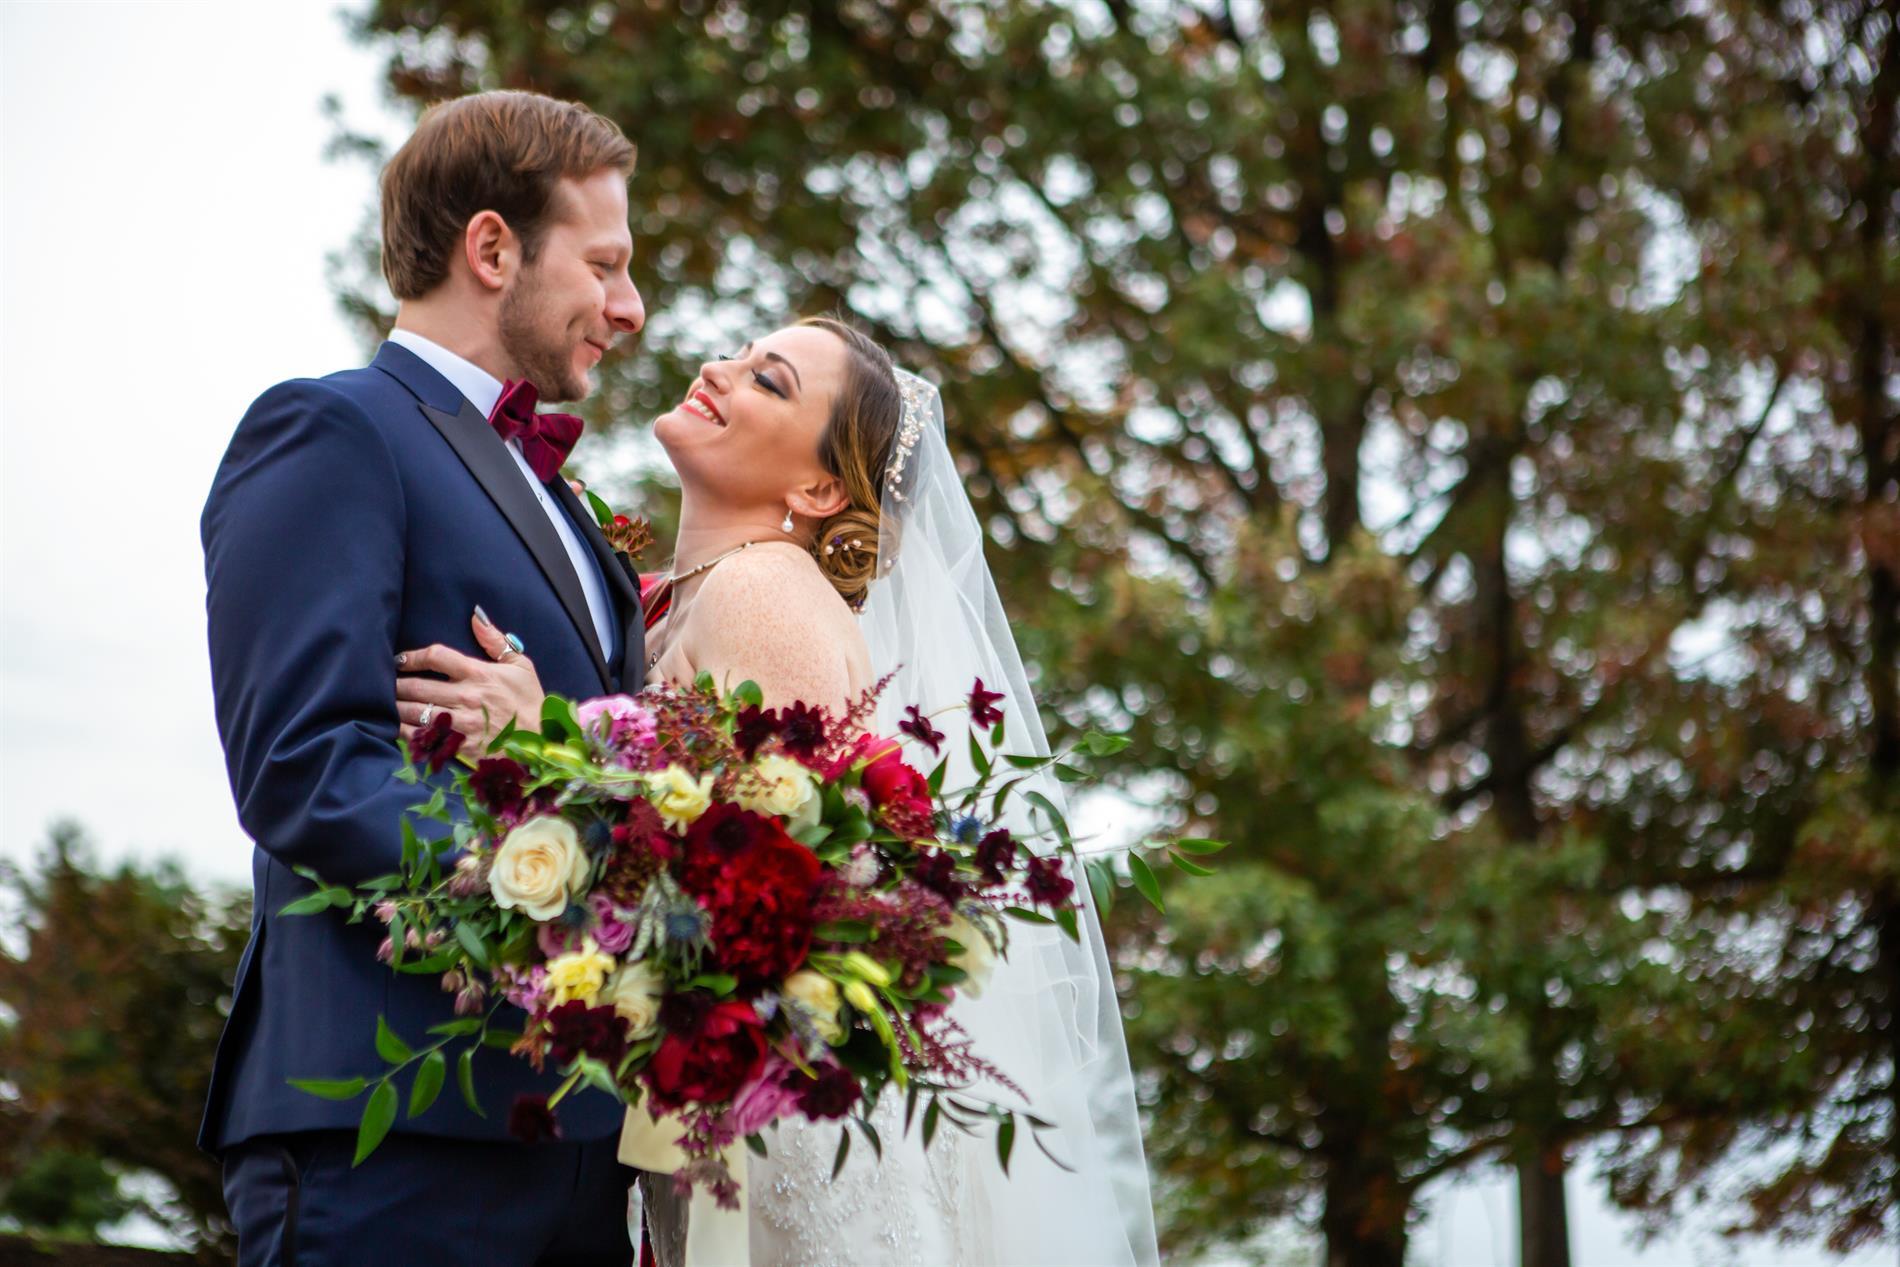 Lindsay-Rose & Dmitry Wedding Photos